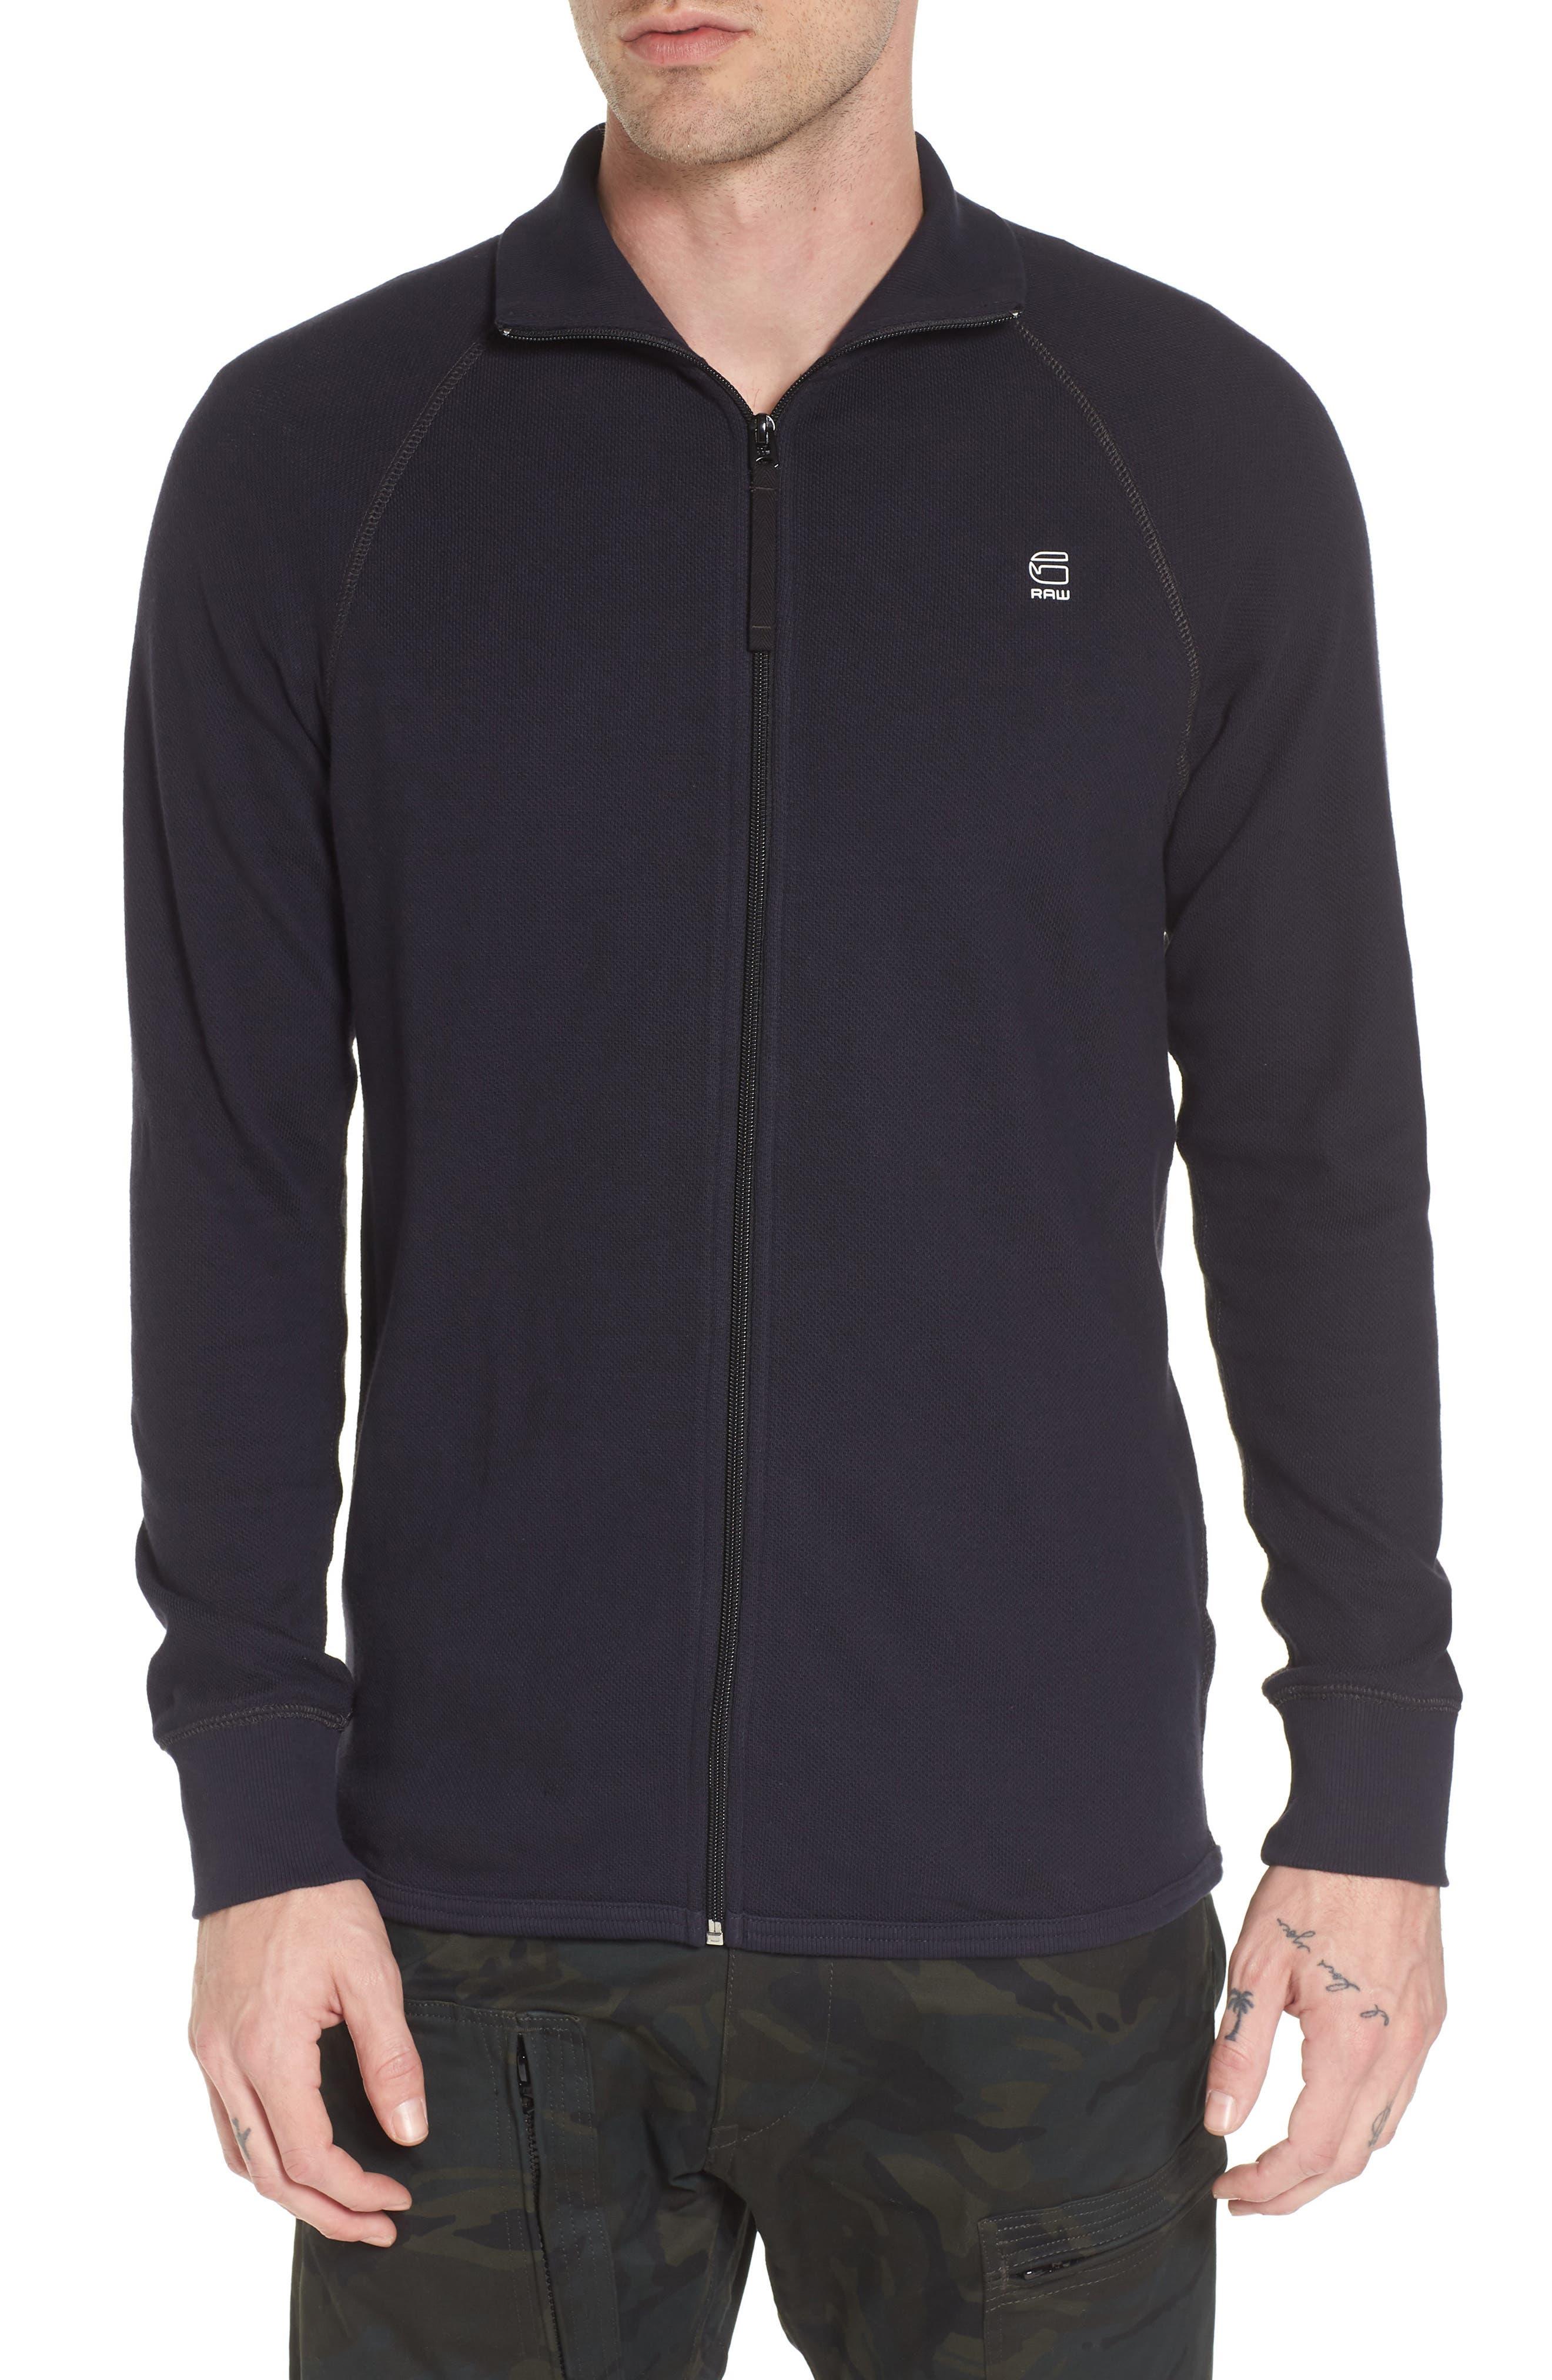 Jirgi Front Zip Sweater,                             Main thumbnail 1, color,                             Dark Naval Blue